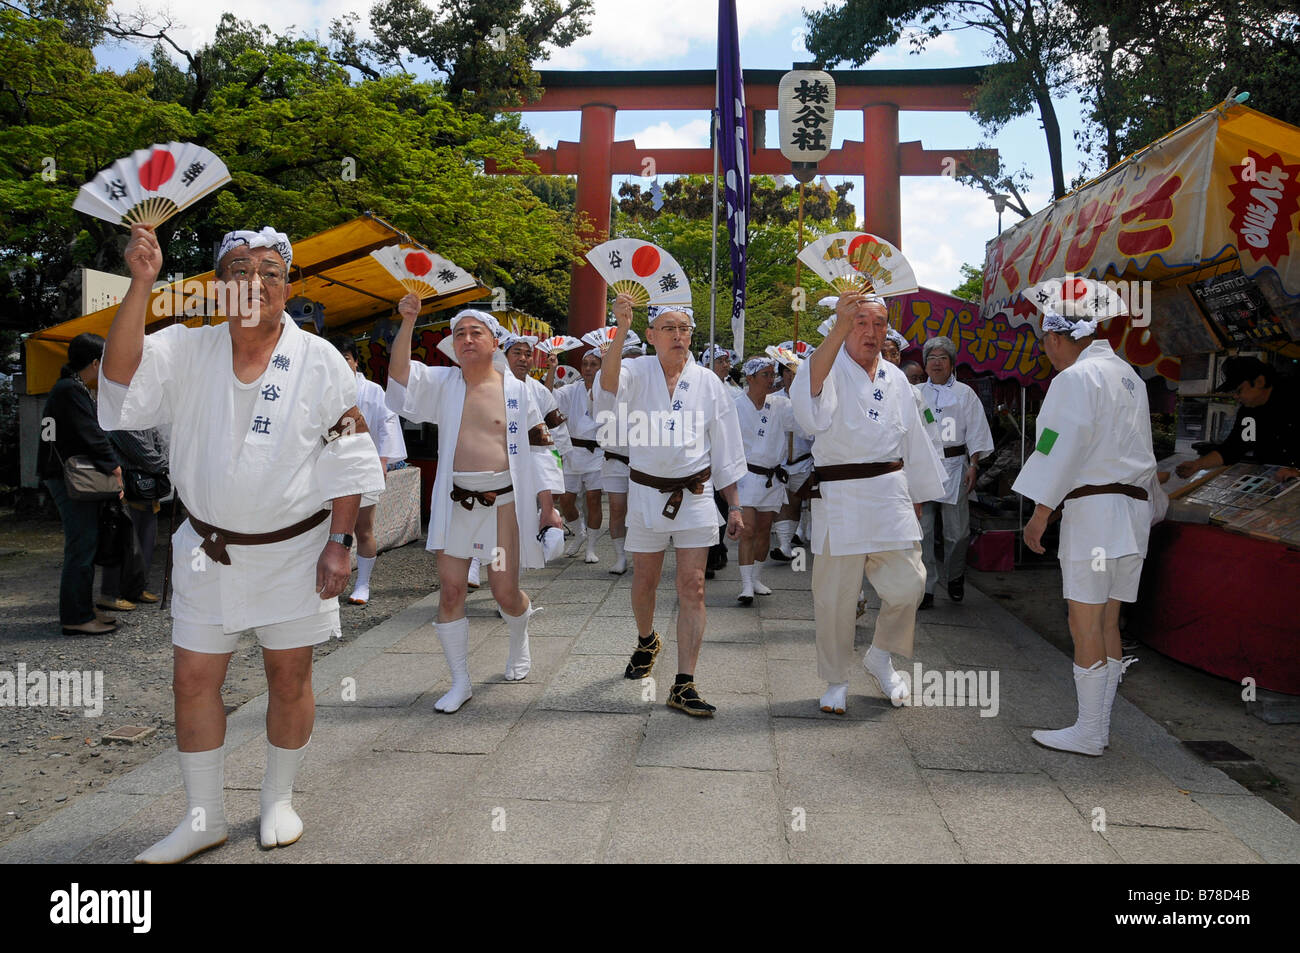 Handles of the shrines being carried accompanied by waving fans, Matsuri Shrine Festival of the Matsuo Taisha Shrine, - Stock Image